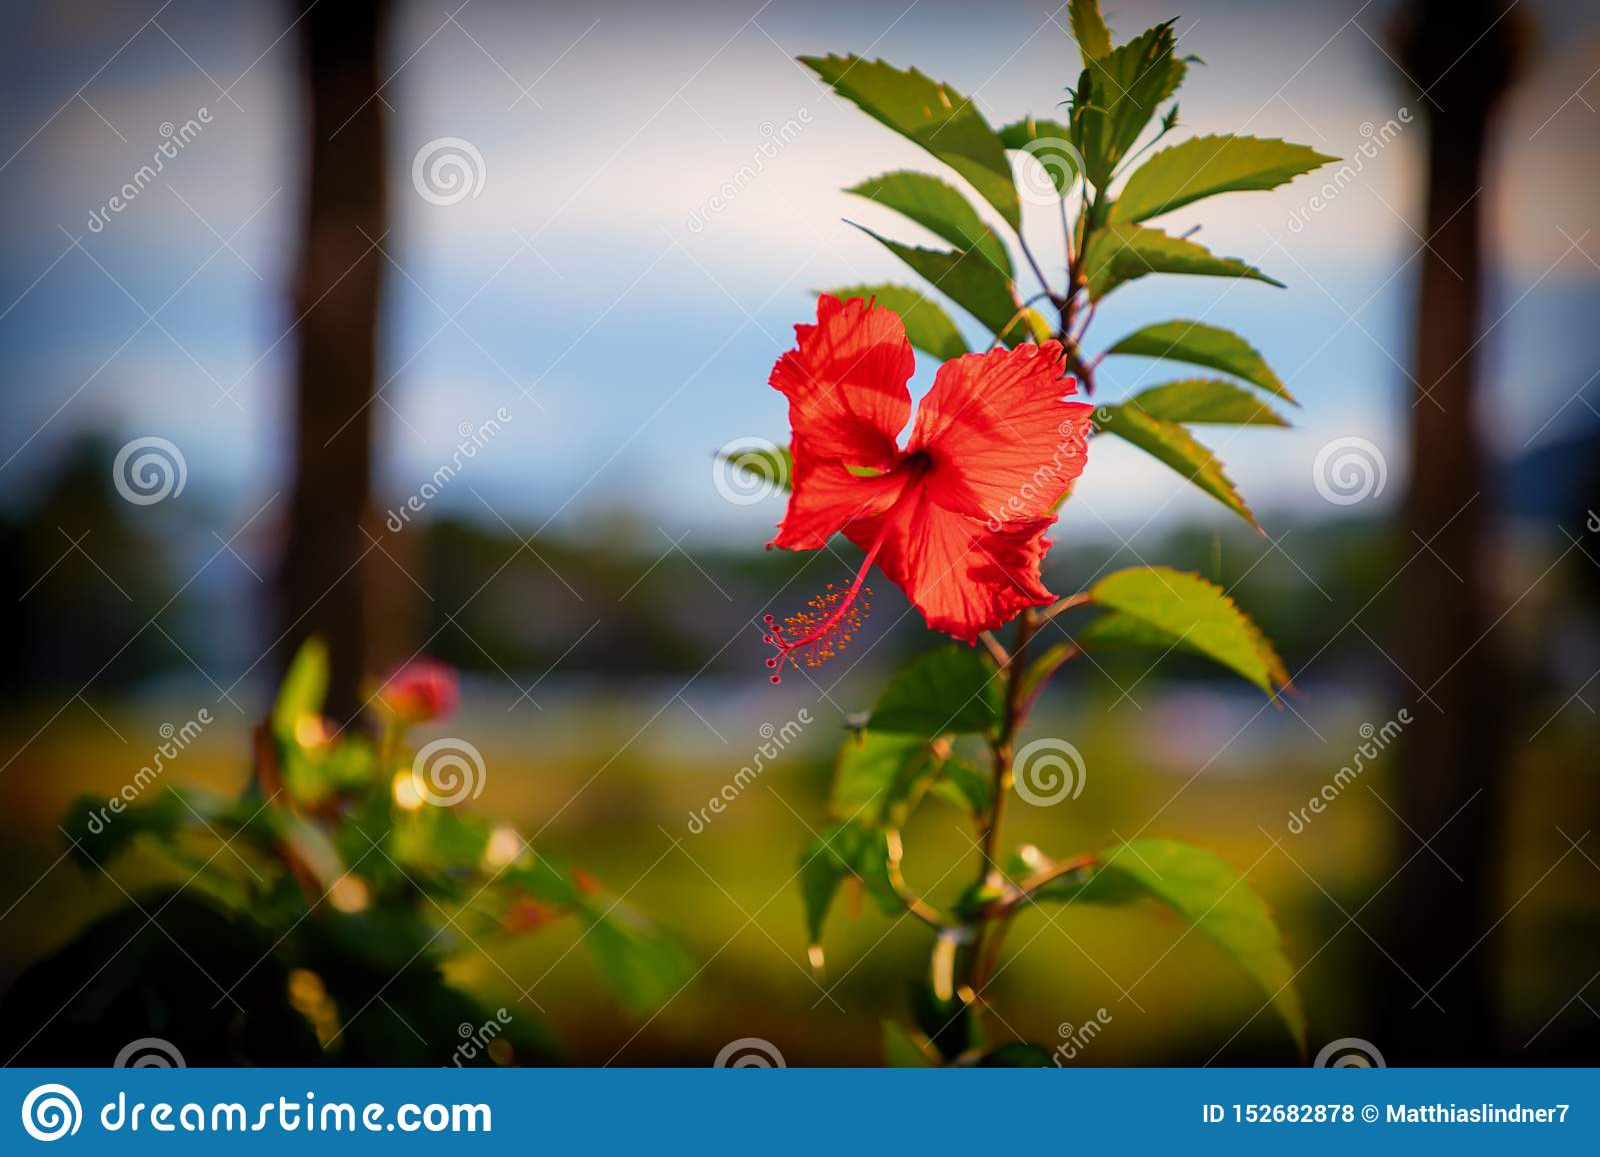 Flor roja del hibisco antes de la puesta del sol Rep?blica del Caribe, Dominicana